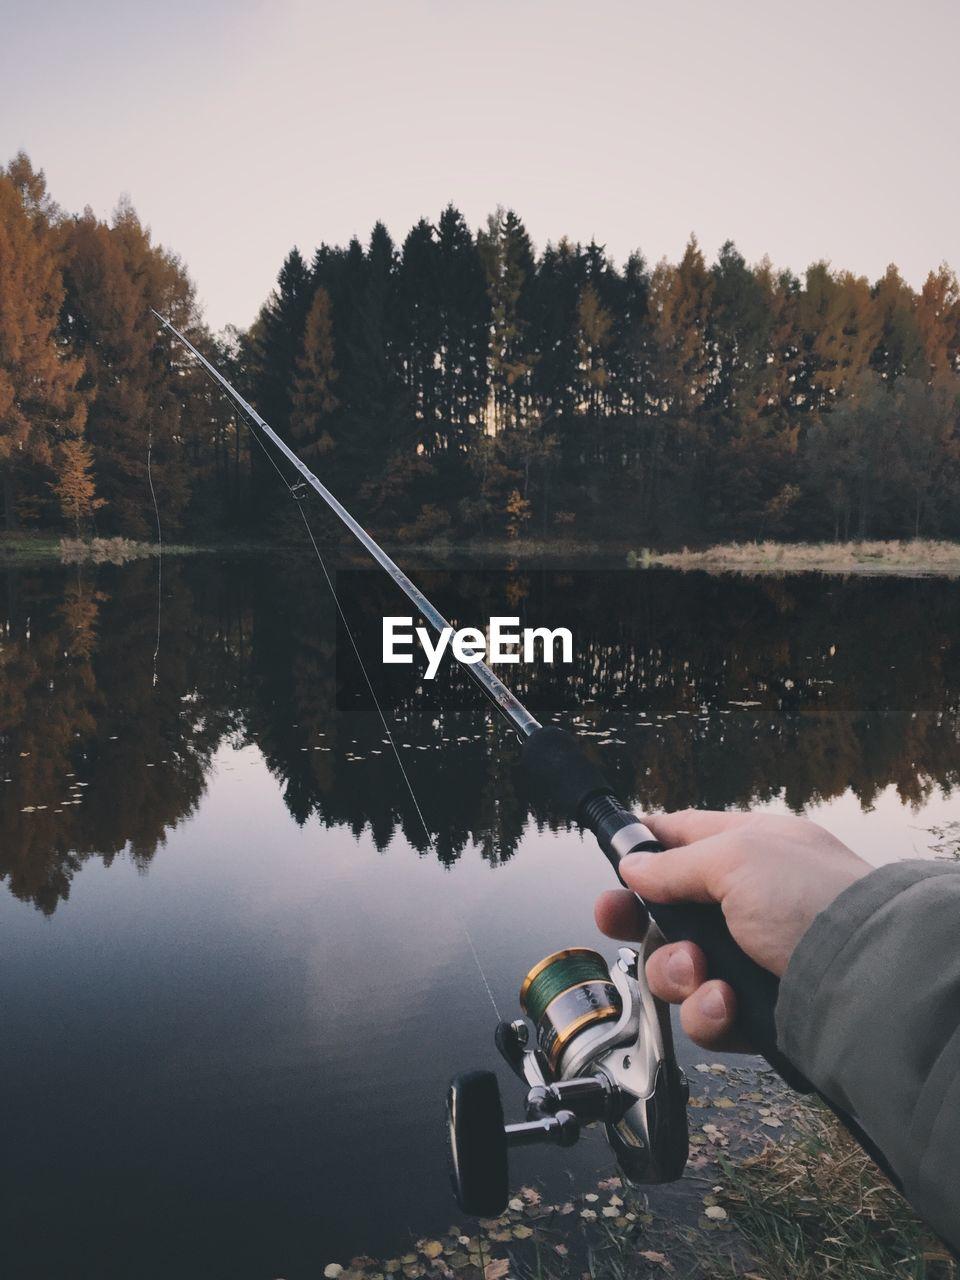 Cropped image of hand holding fishing rod at lakeshore